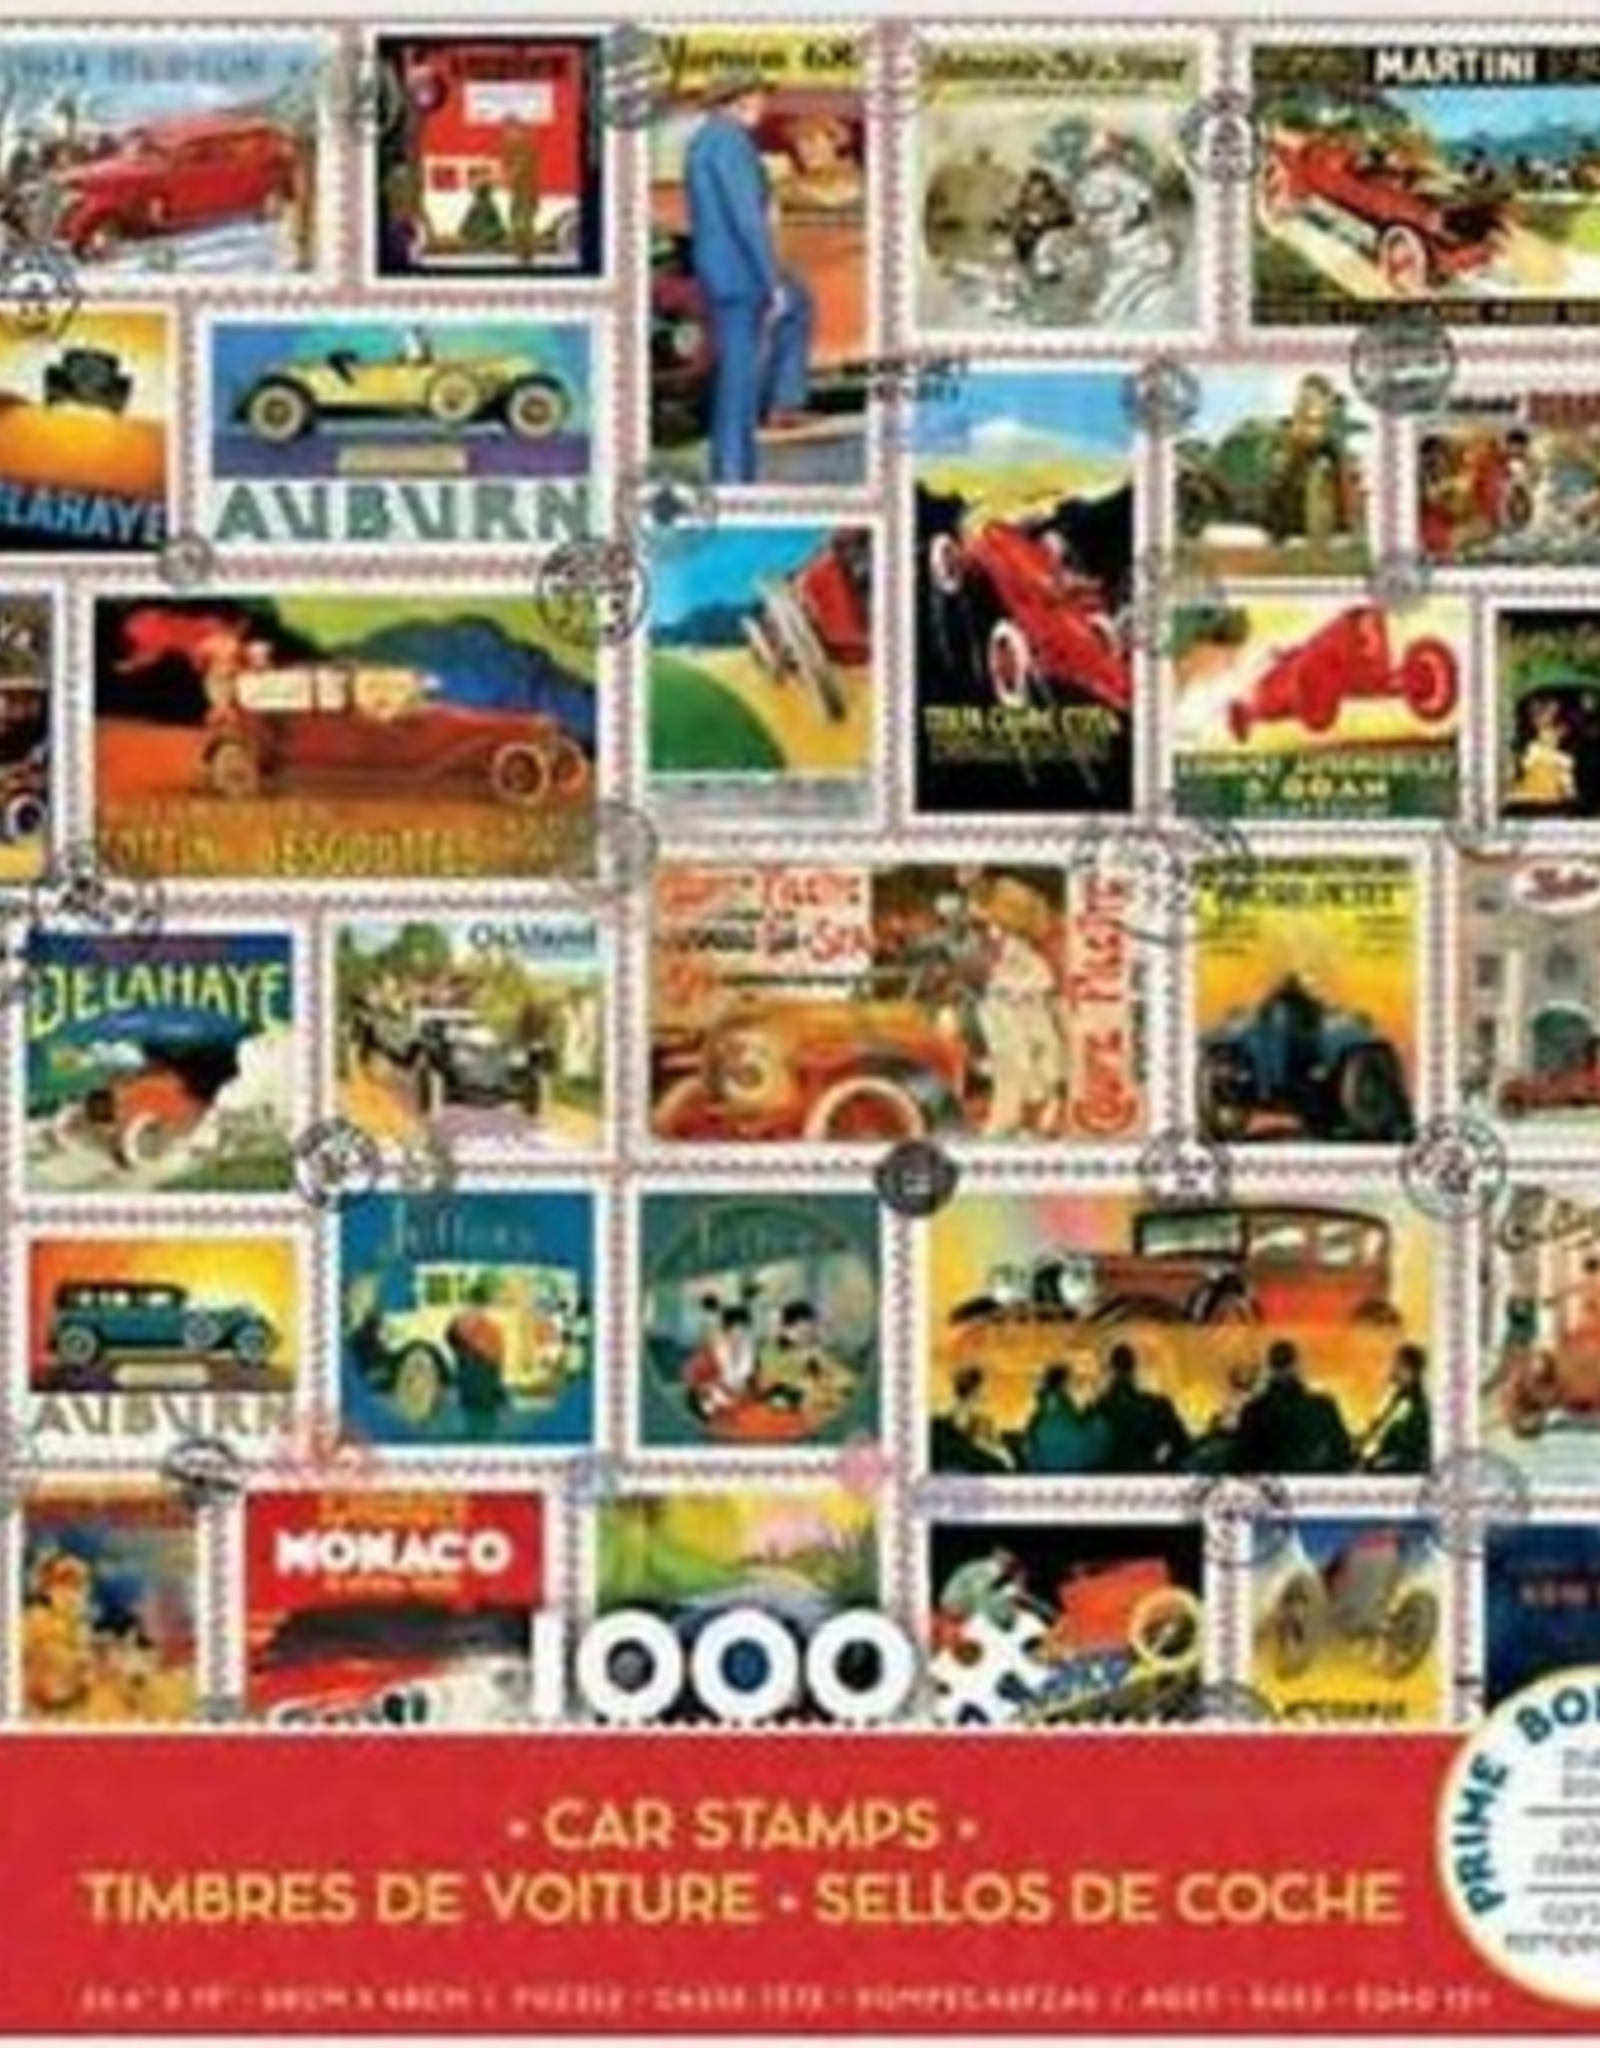 CEACO 1000pc puzzle - Car Stamps